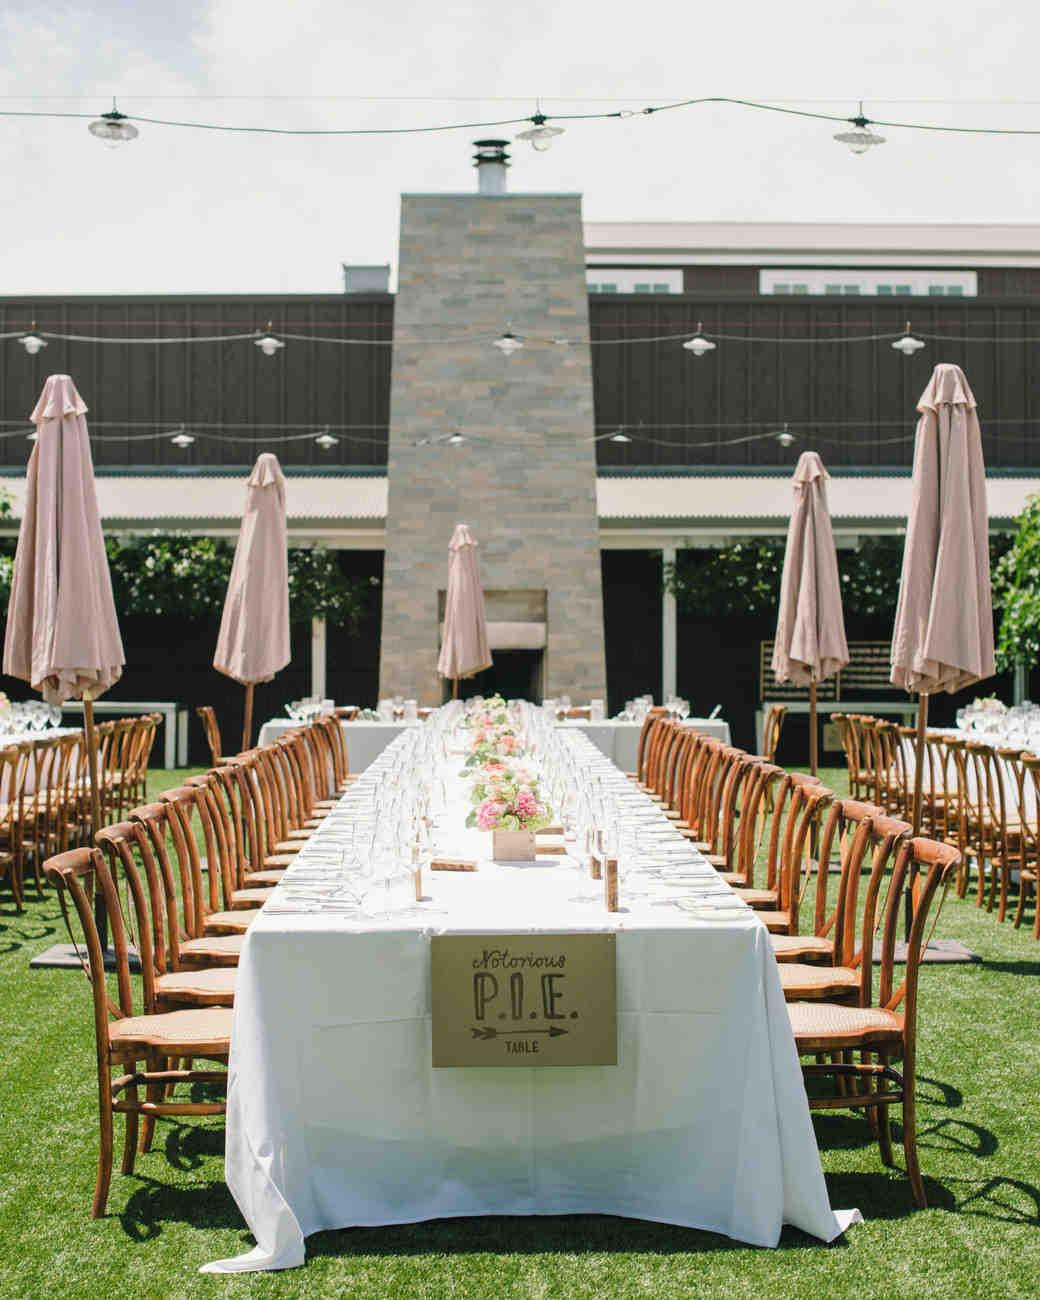 vanessa-joe-wedding-reception-11221-s111736-1214.jpg